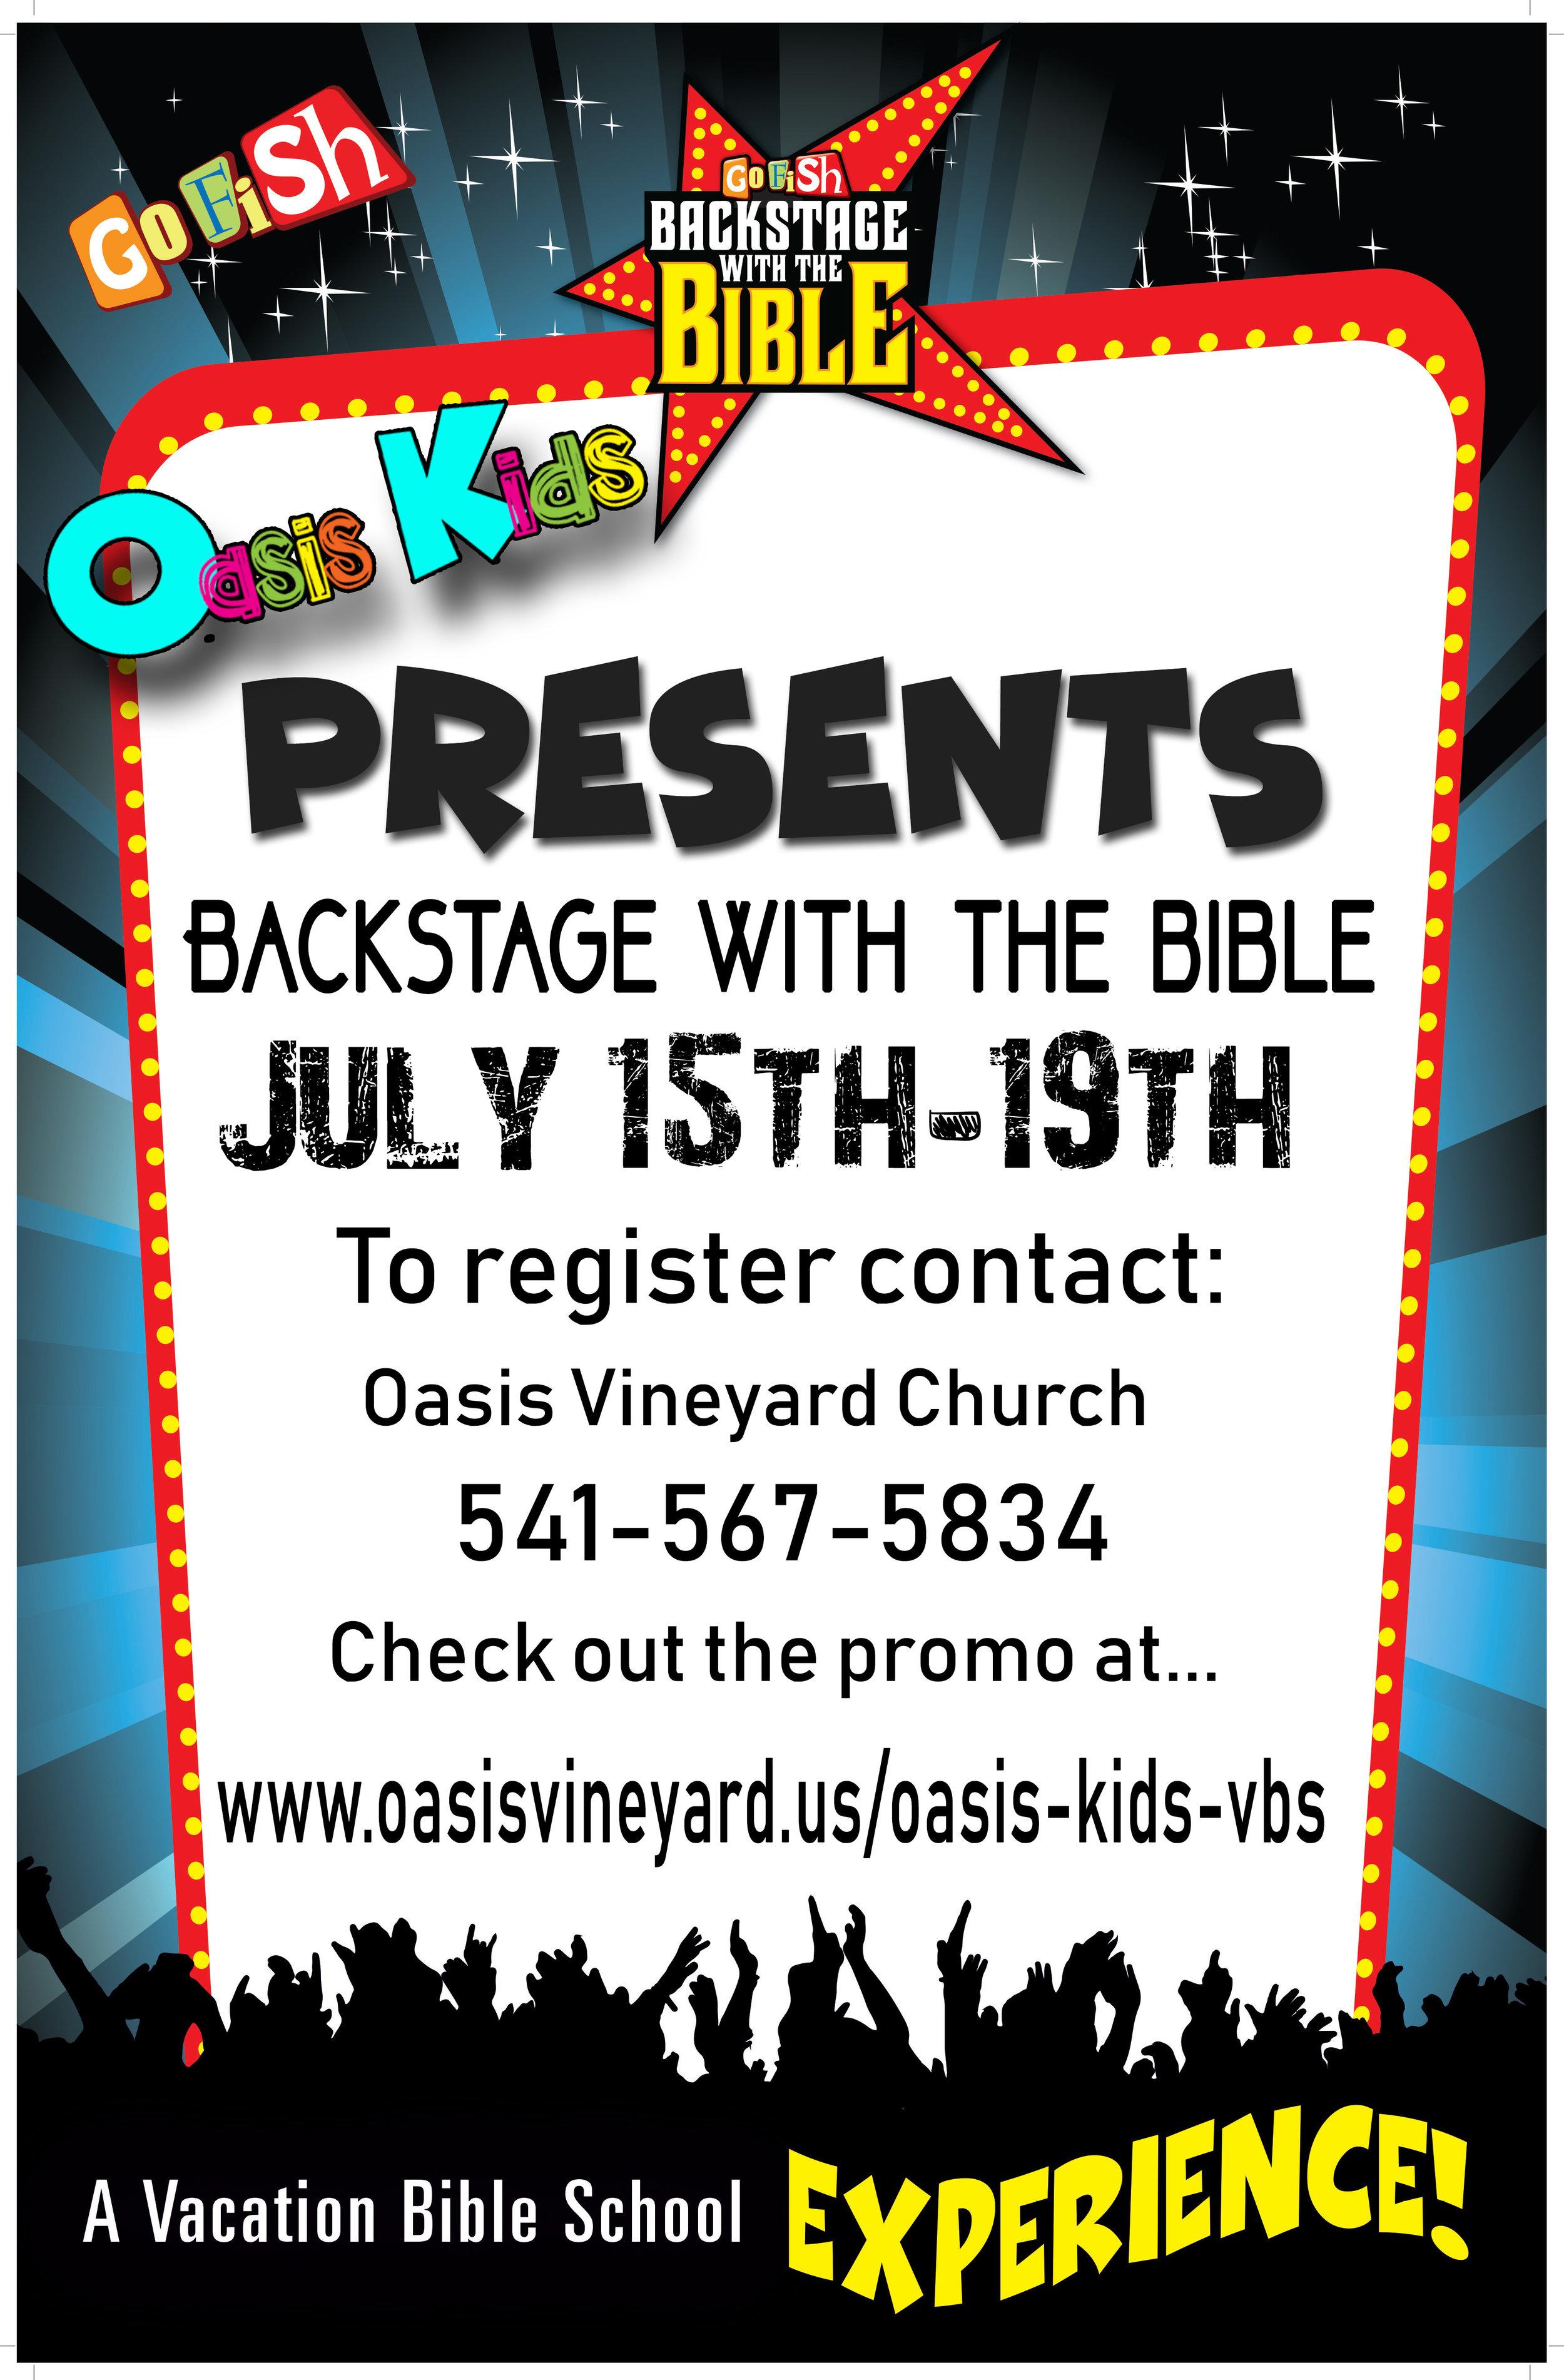 BSWB VBS Promo Poster 1.jpg